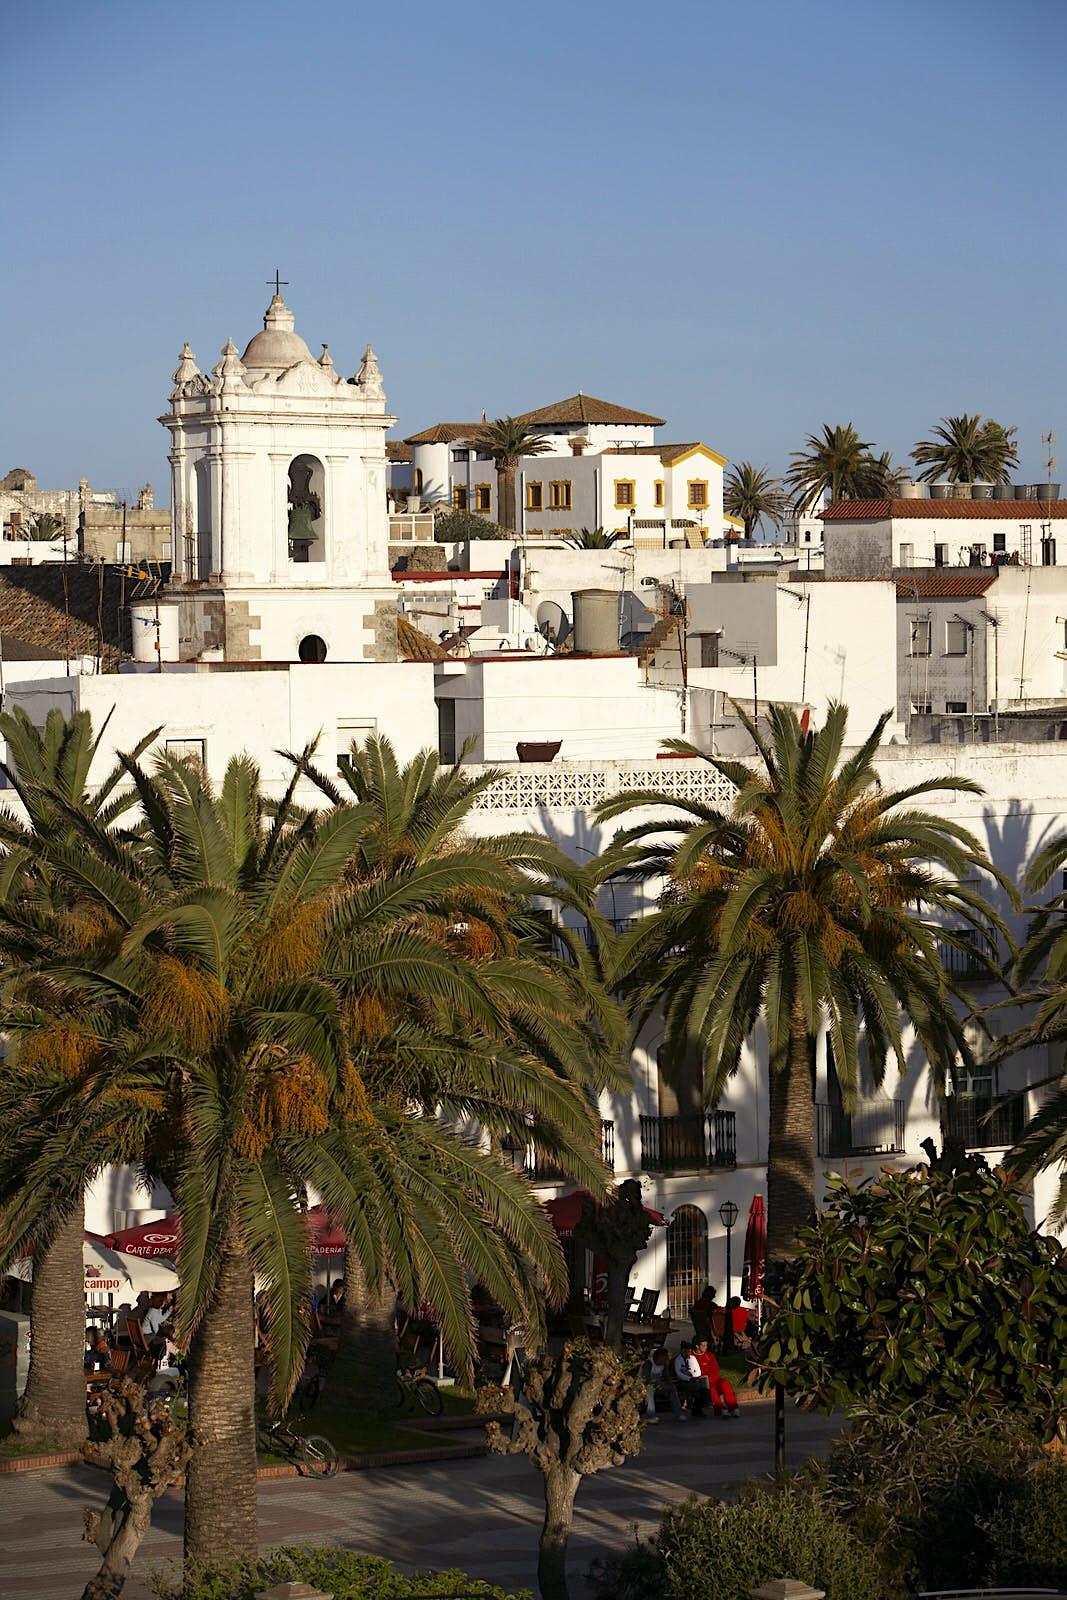 Old Town hotels, San Sebastian, Spain: San Sebastian Hotel